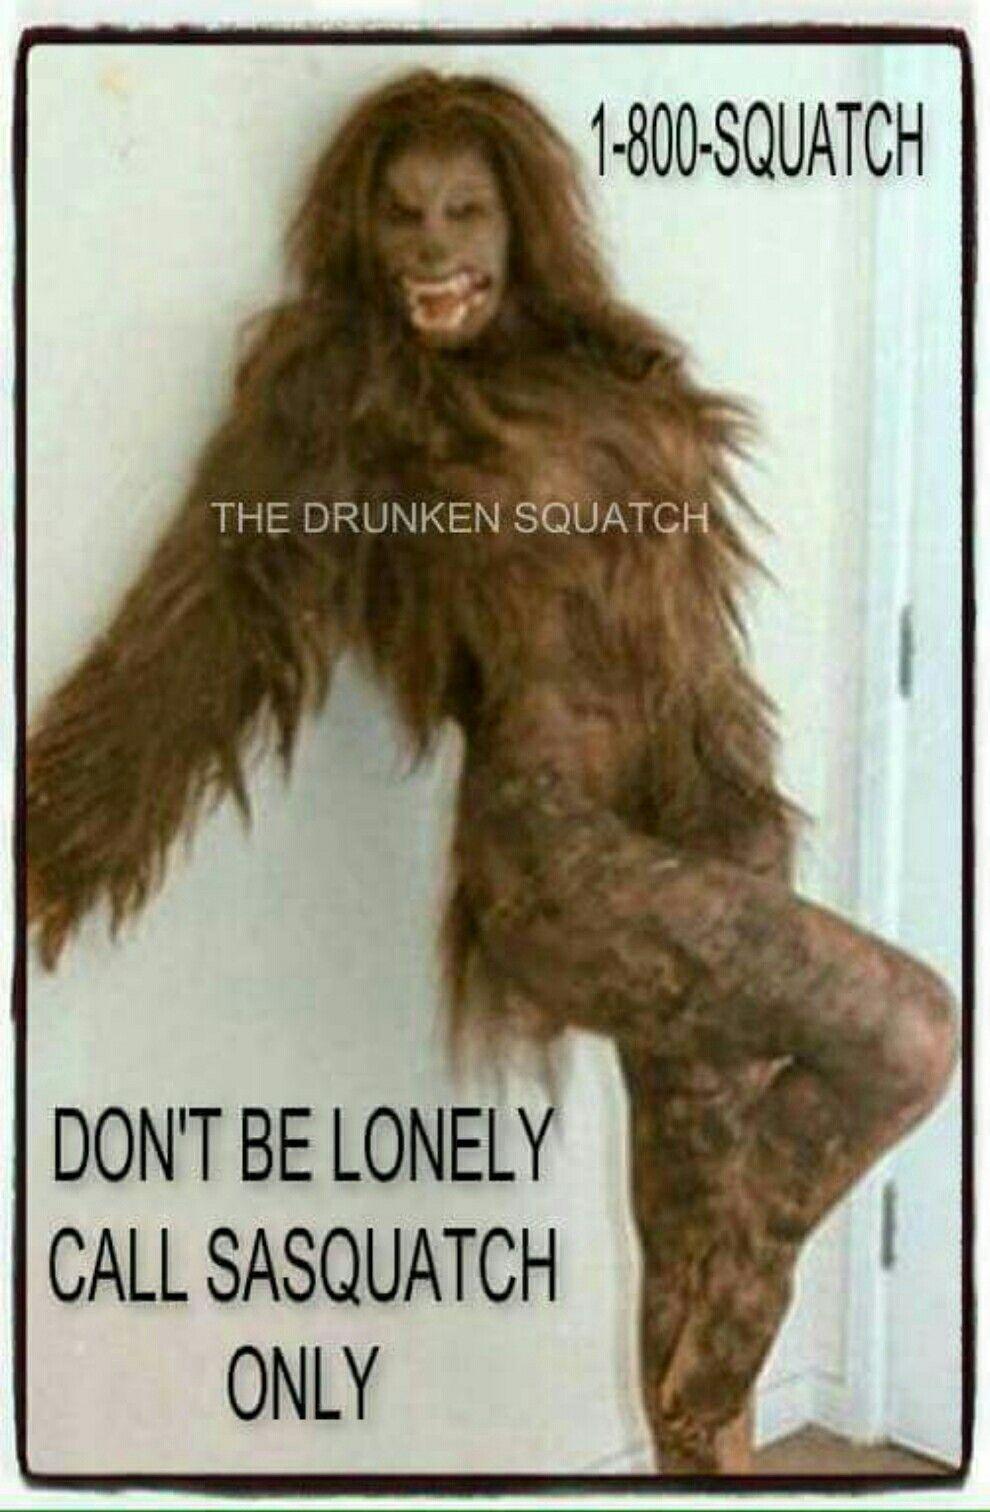 c0e3a76bda25 Sexy Squatch Legend of Sasquatch Pinterest Bigfoot and Finding